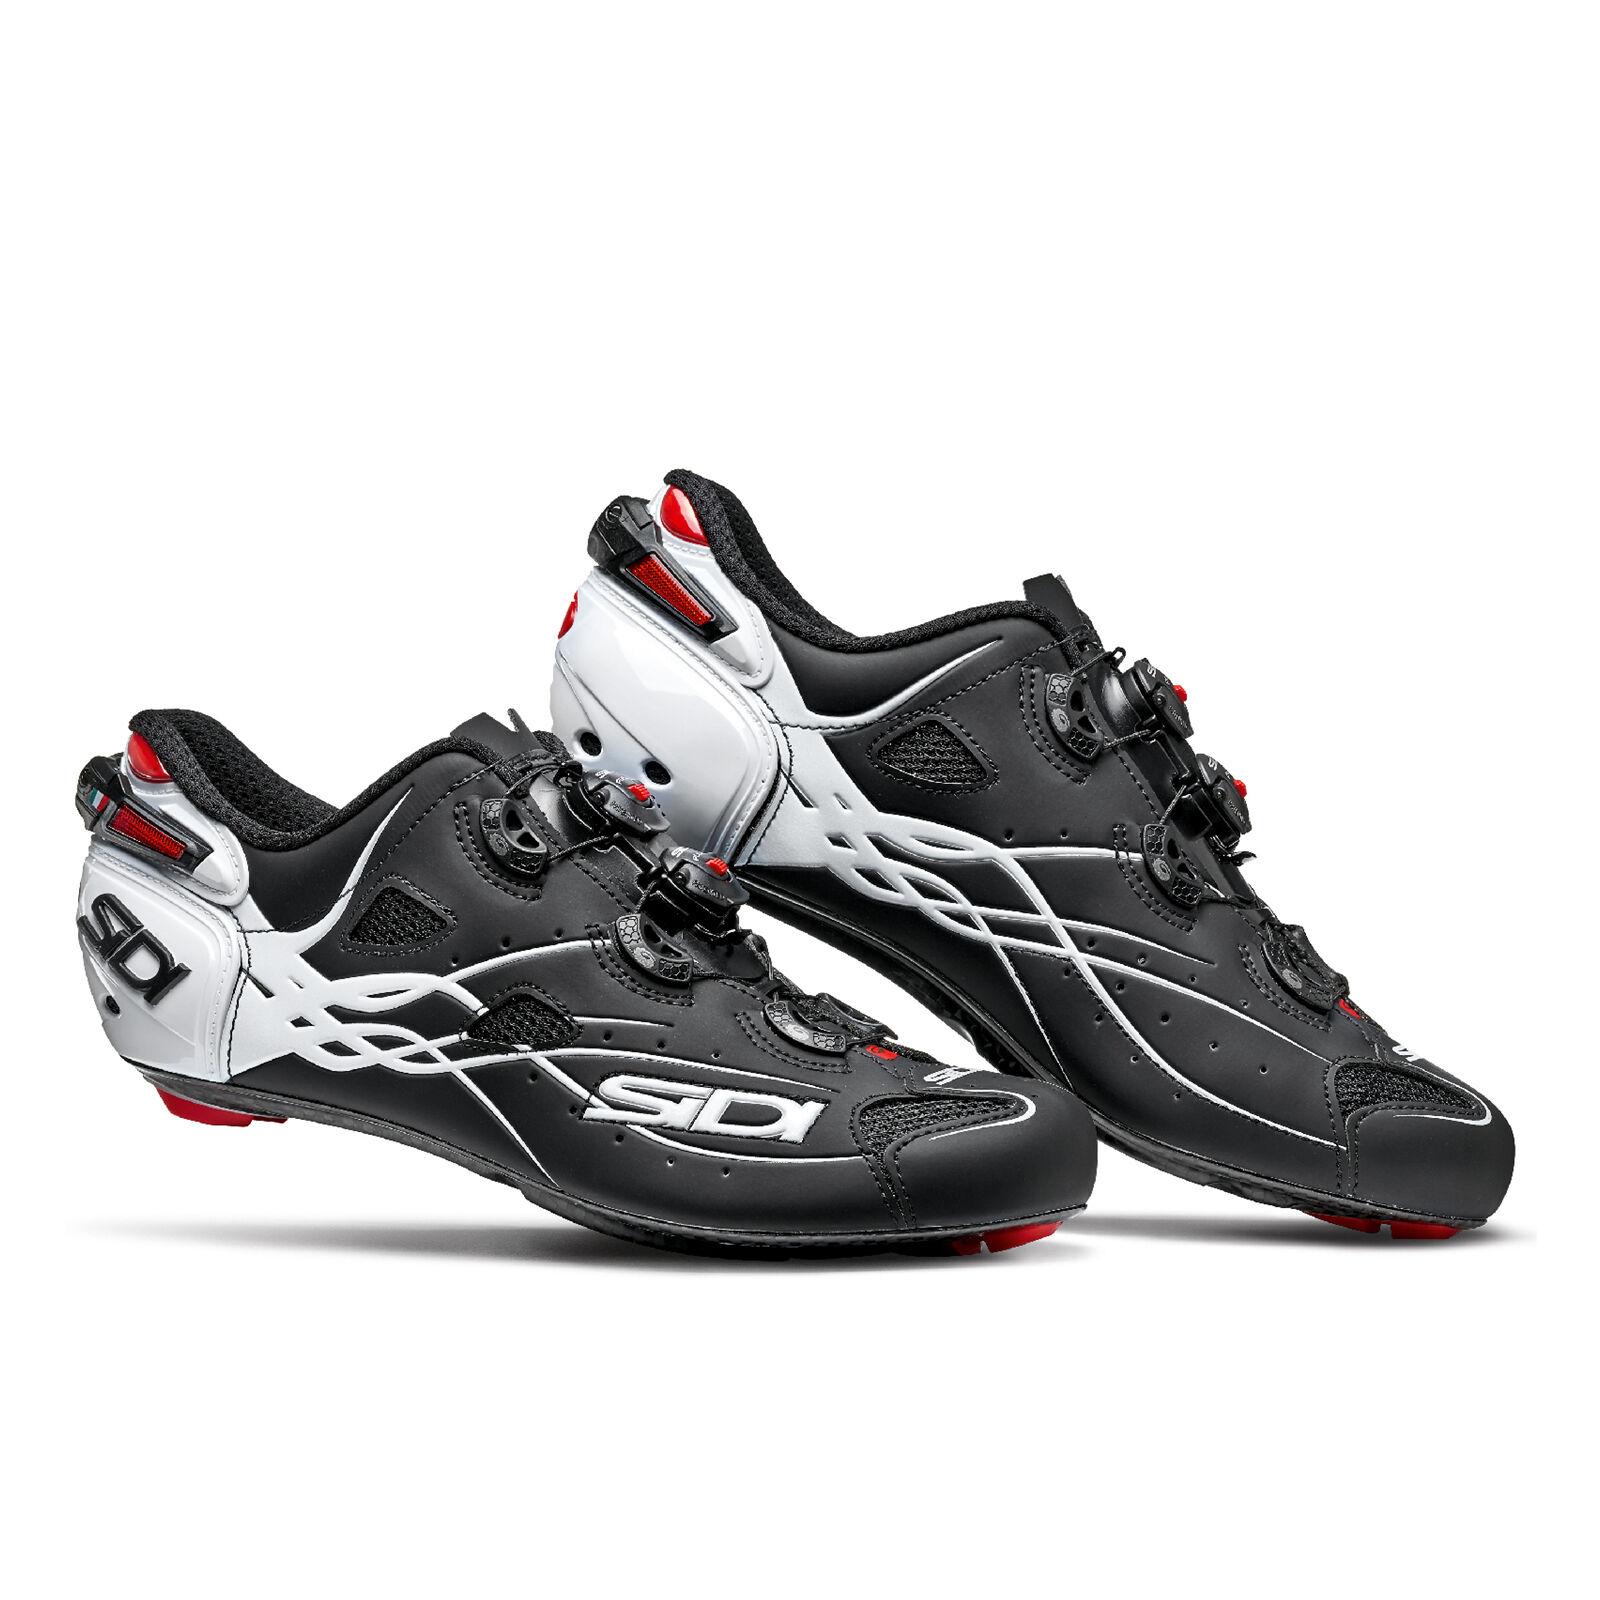 Sidi Shot Carbon Road Shoes - Matt Black/Gloss White - EU 46 - Matt Black/Gloss White